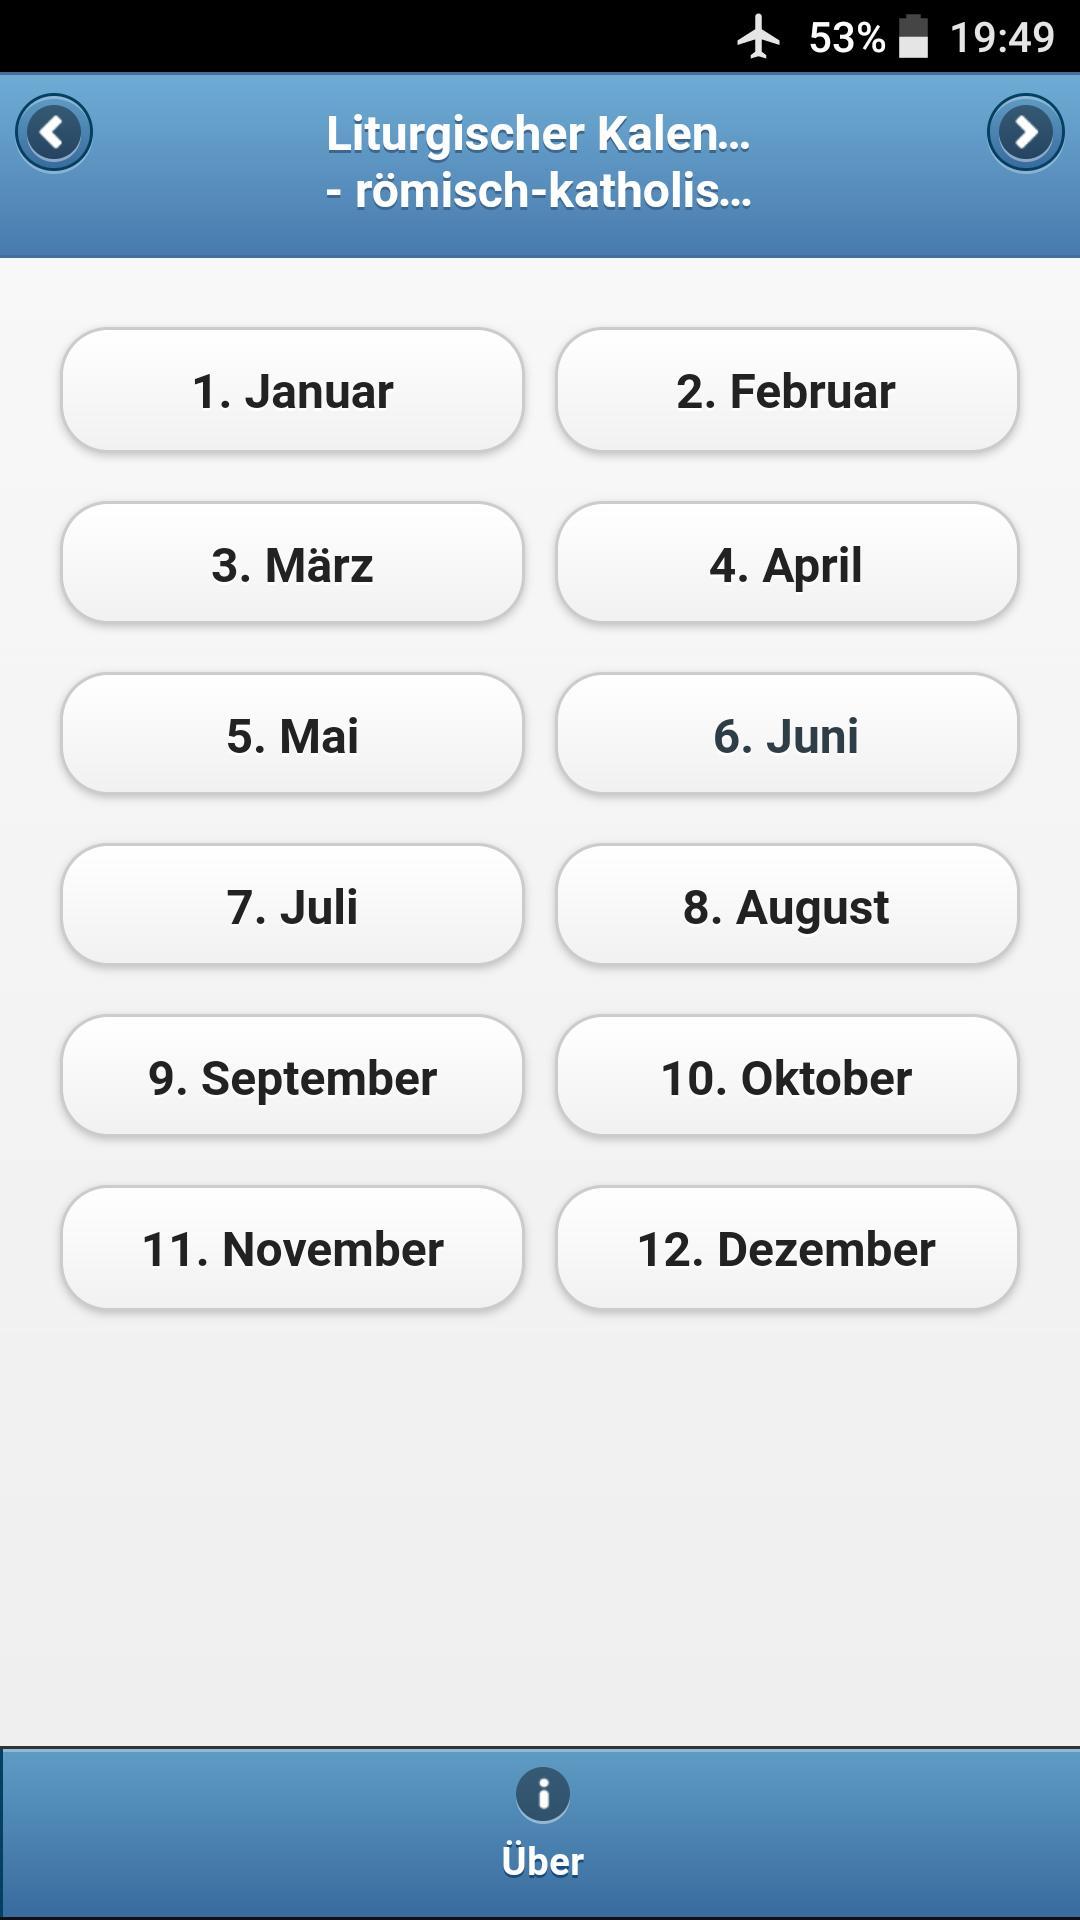 Liturgischer Kalender 2017 poster